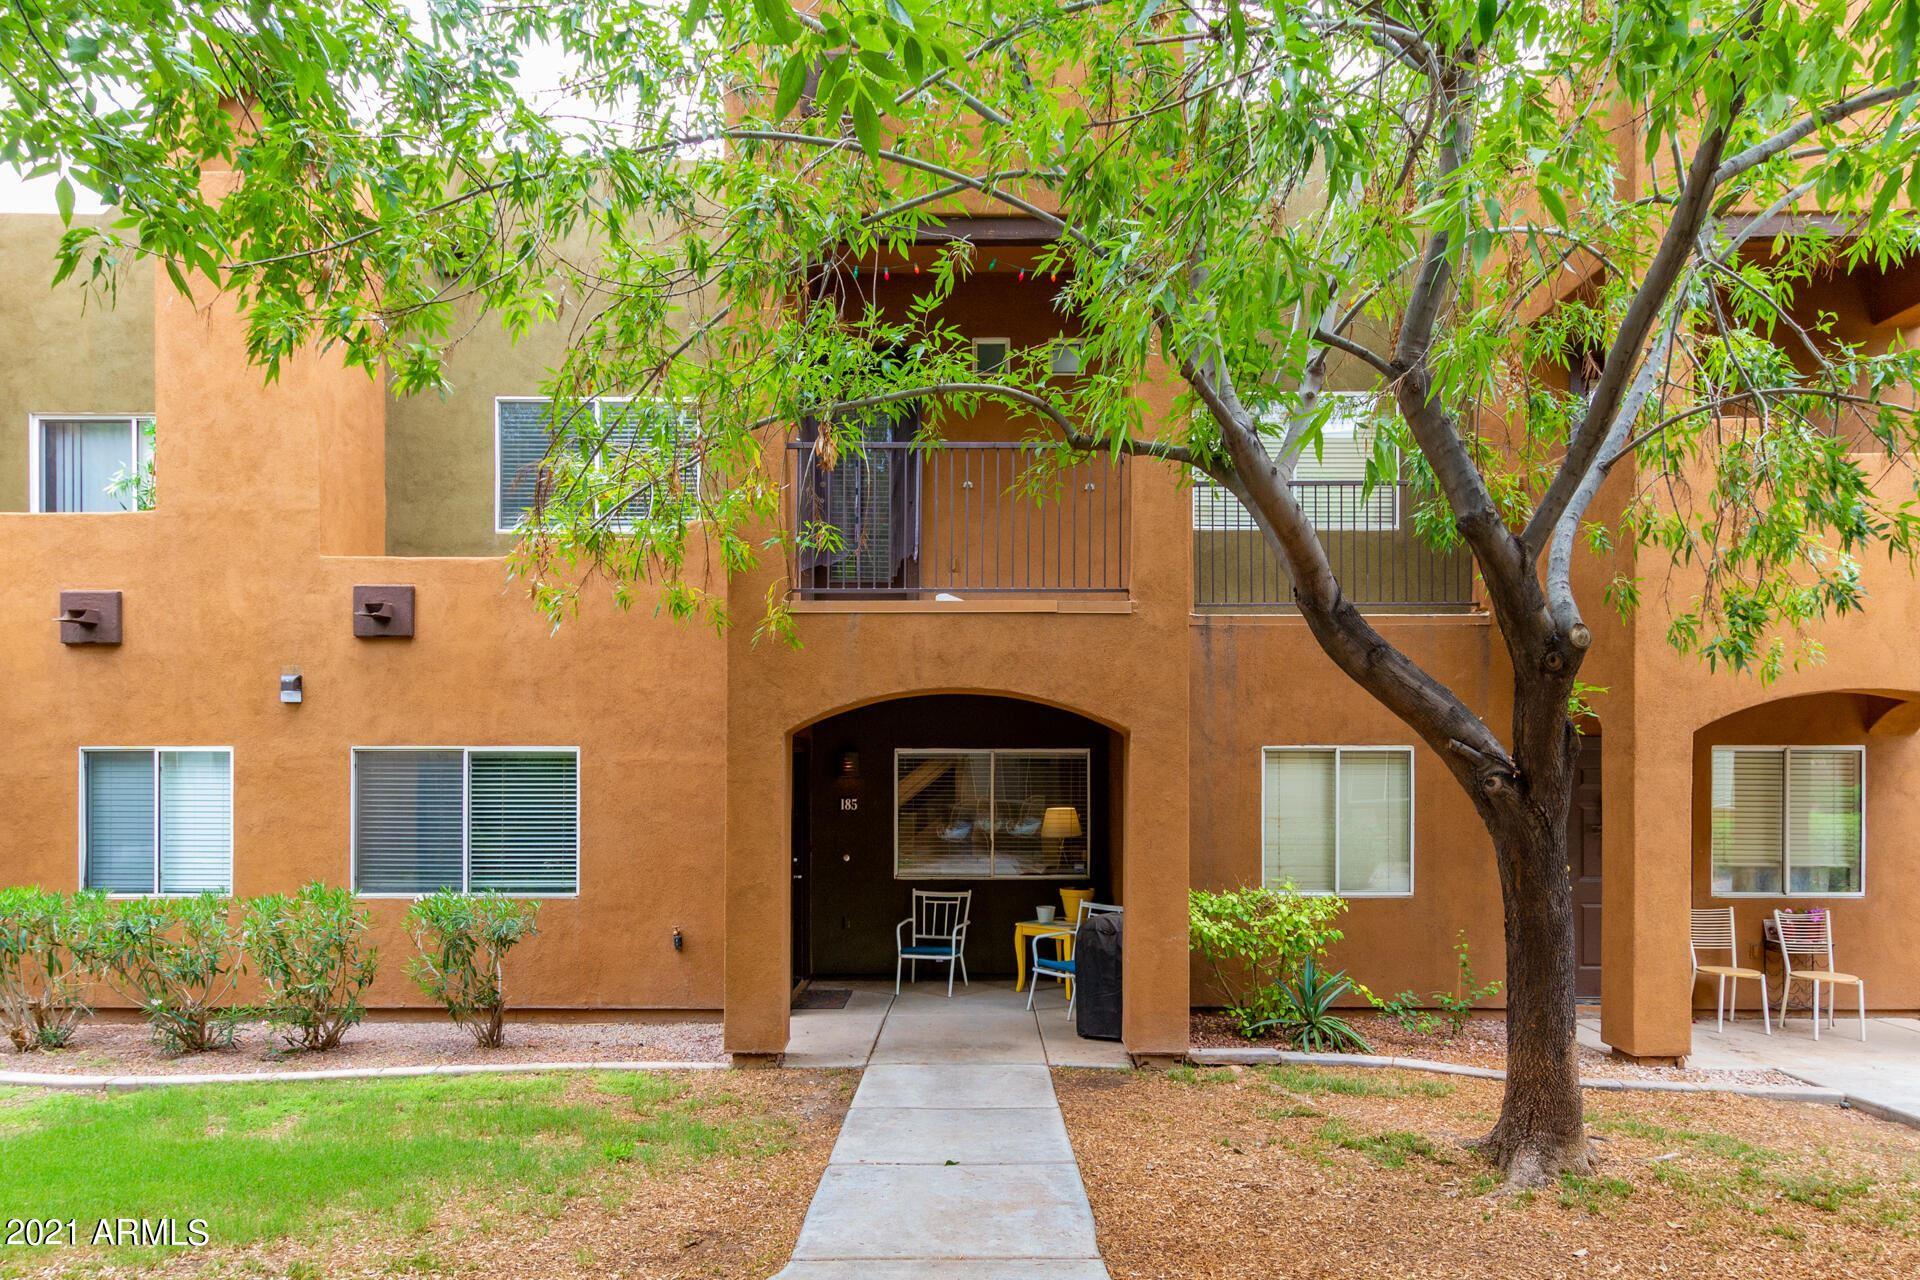 1718 W COLTER Street #185, Phoenix, AZ 85015 - MLS#: 6272224